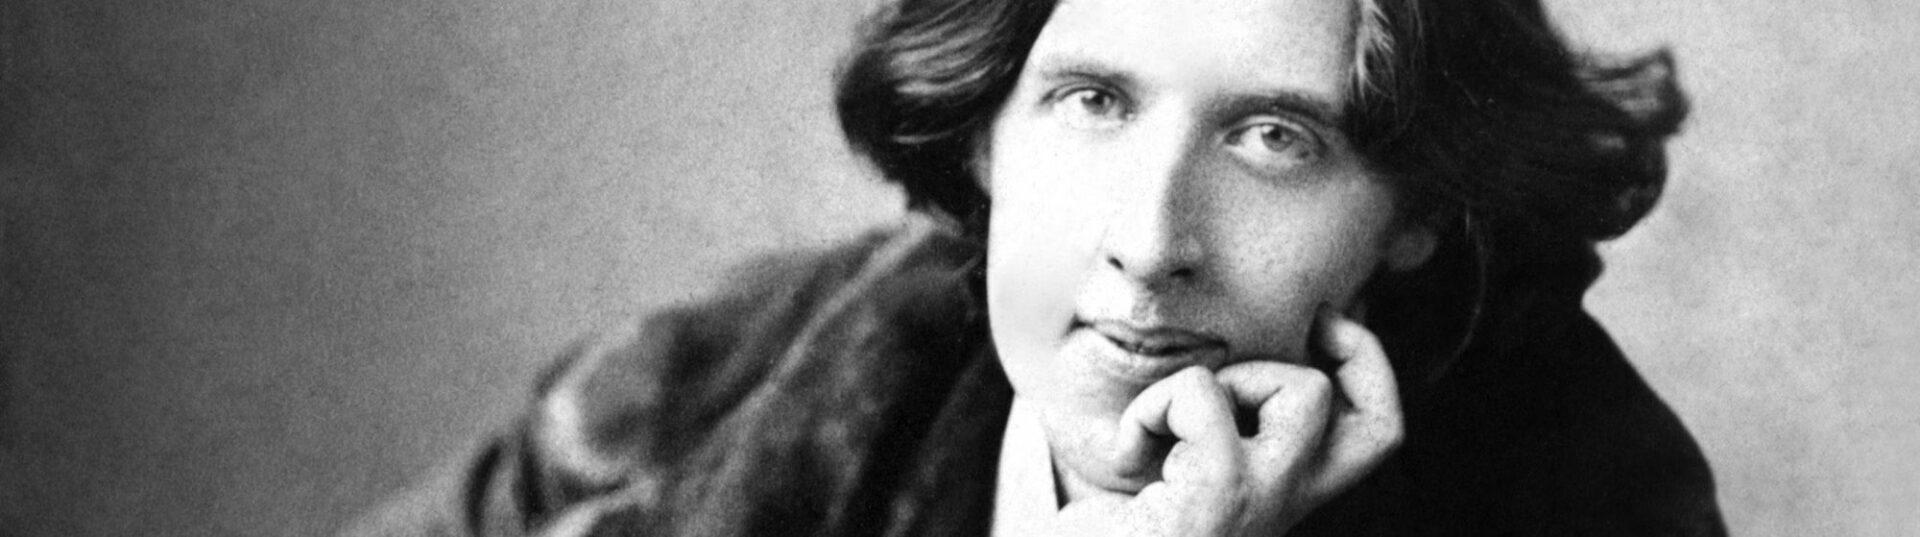 Taedium Vitae – Oscar Wilde